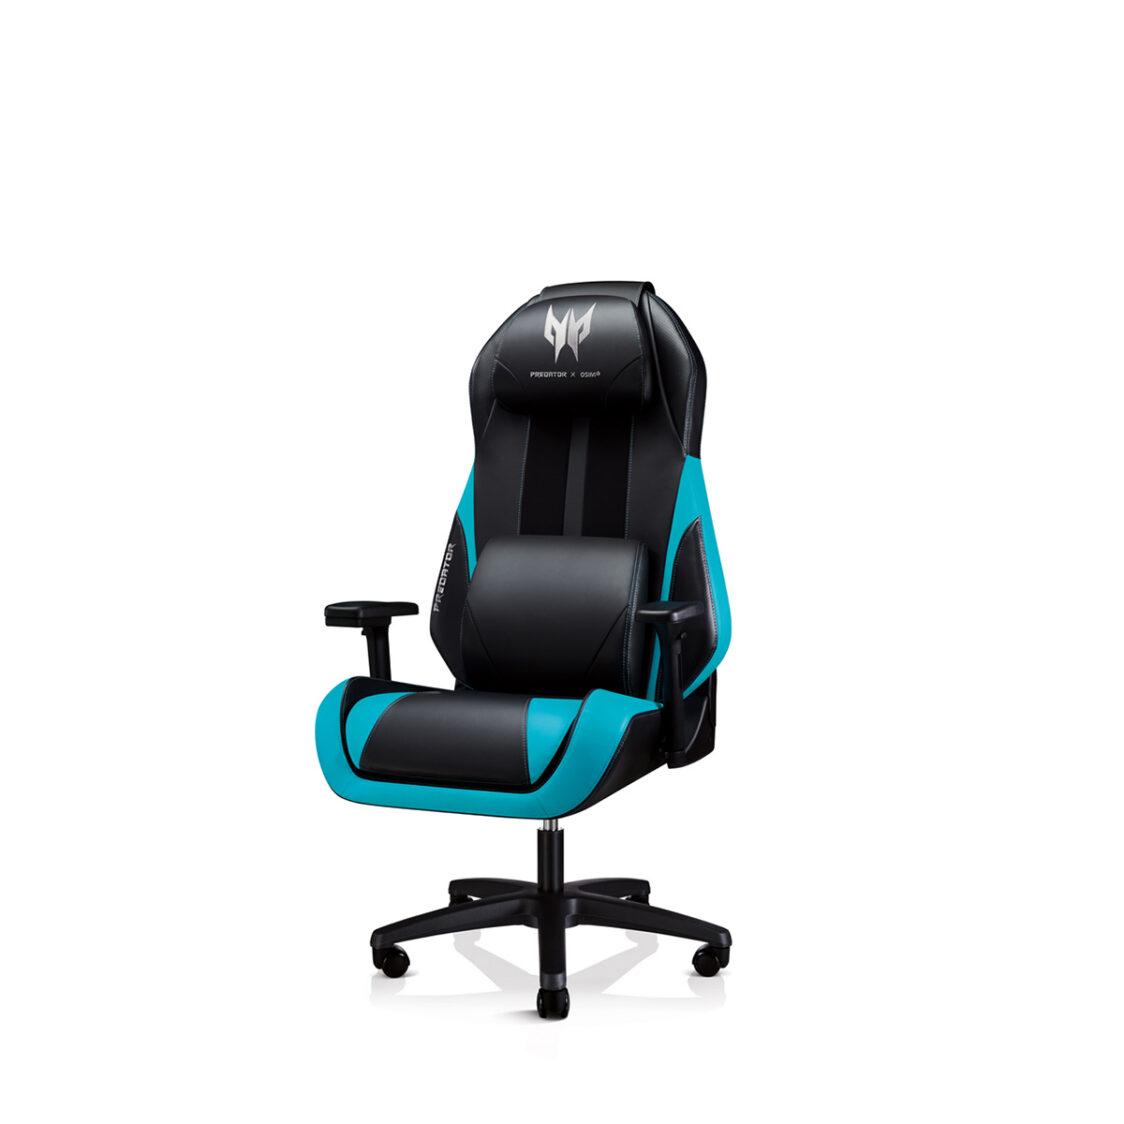 OSIM x Predator Gaming Chair Blue